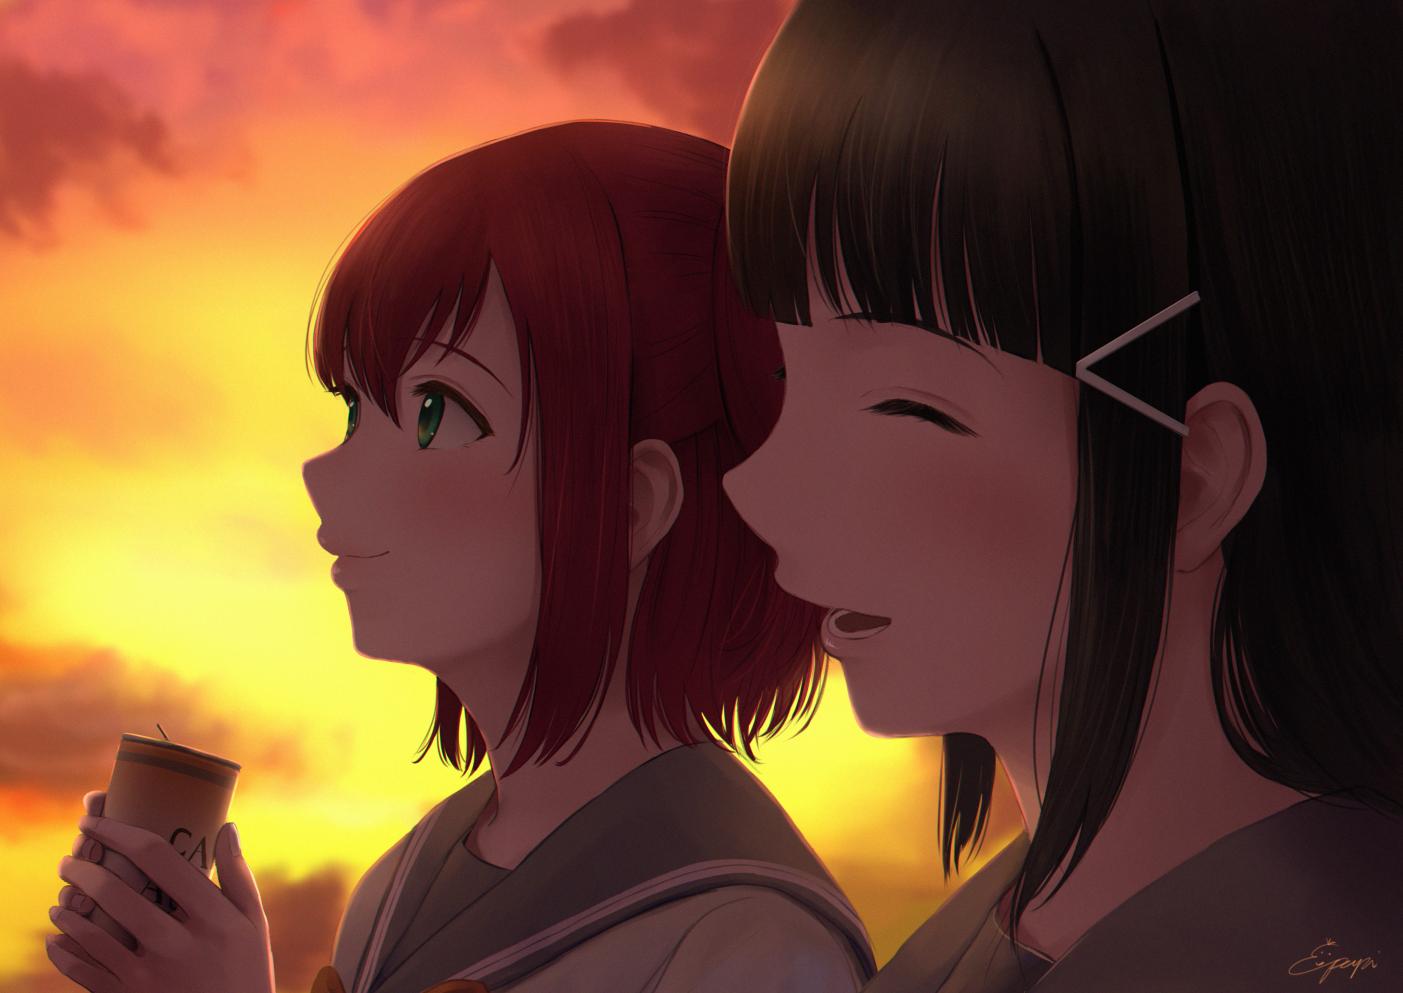 2girls black_hair close drink green_eyes kurosawa_dia kurosawa_ruby long_hair love_live!_school_idol_project love_live!_sunshine!! papi_(papiron100) red_hair short_hair signed sunset